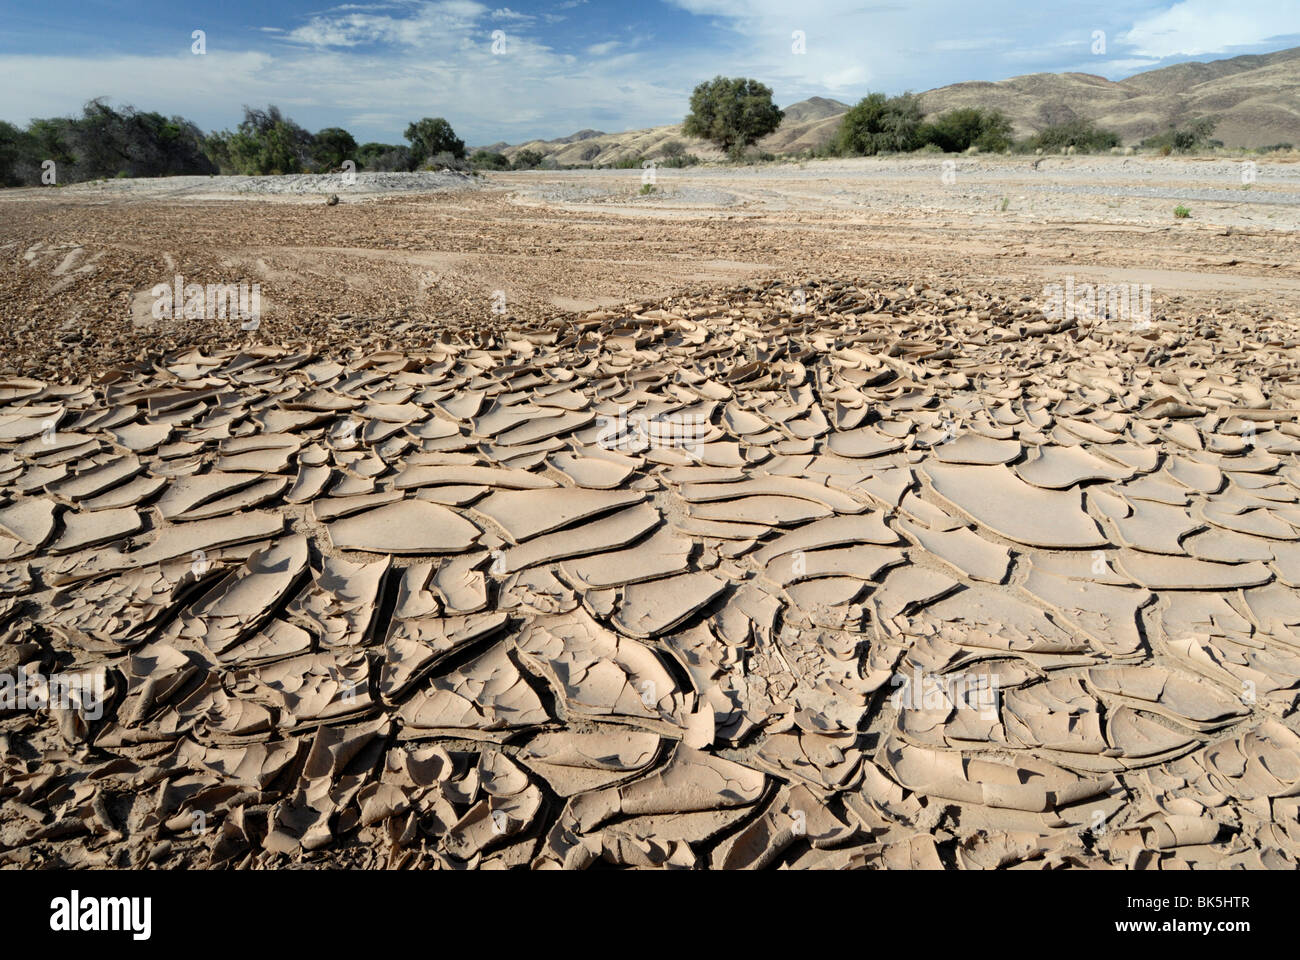 Dried river bed, Kaokoland, Namibia, Africa Stock Photo